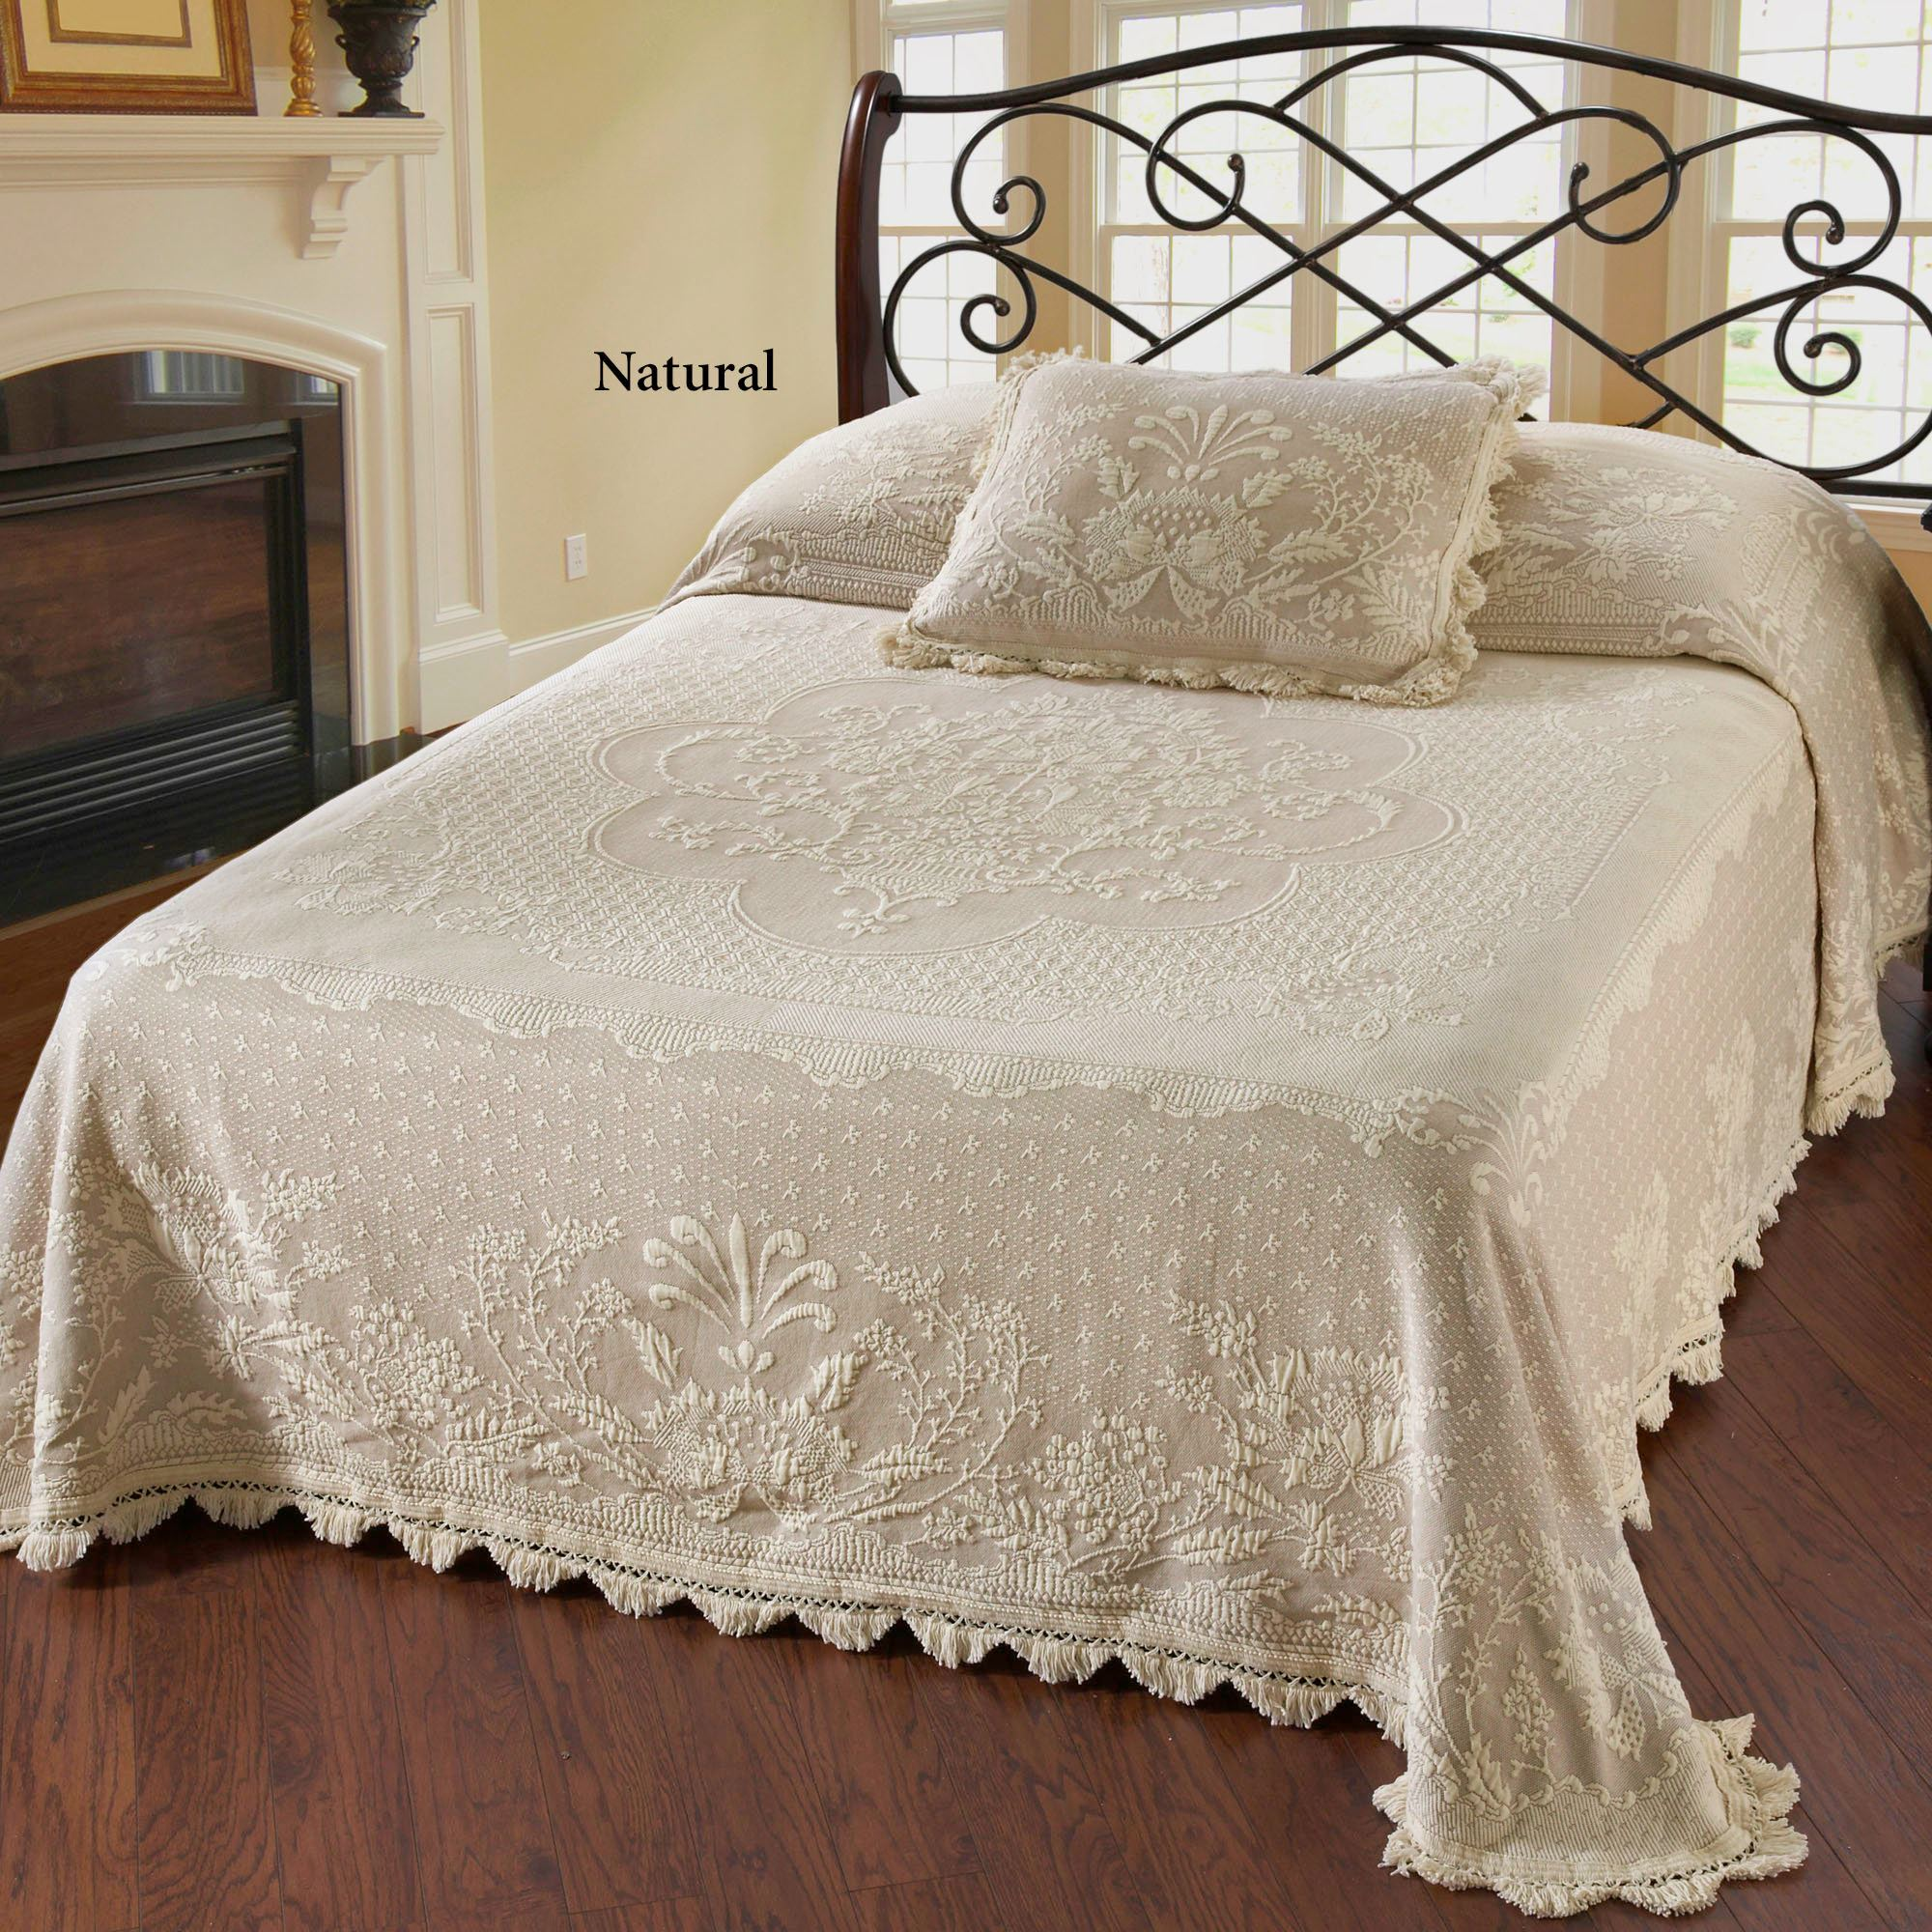 matelasse lis ln ebay bedding itm superior bedspread fleur cotton de tw bed